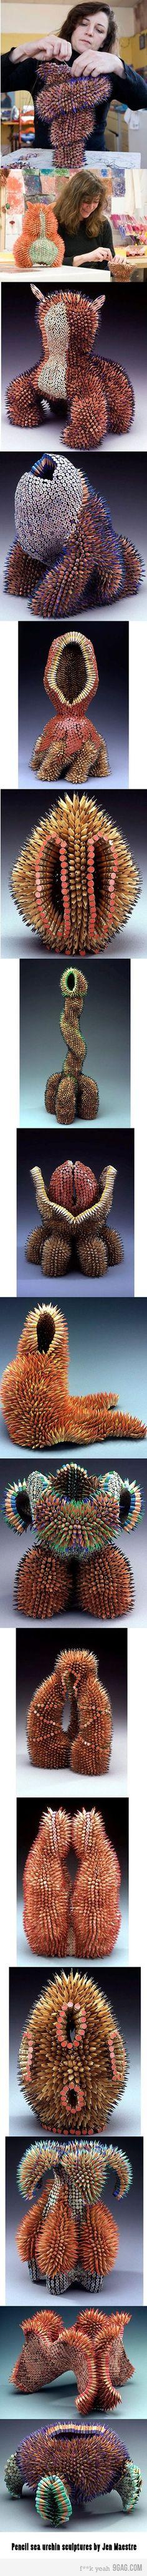 pencil sea urchin sculptures.